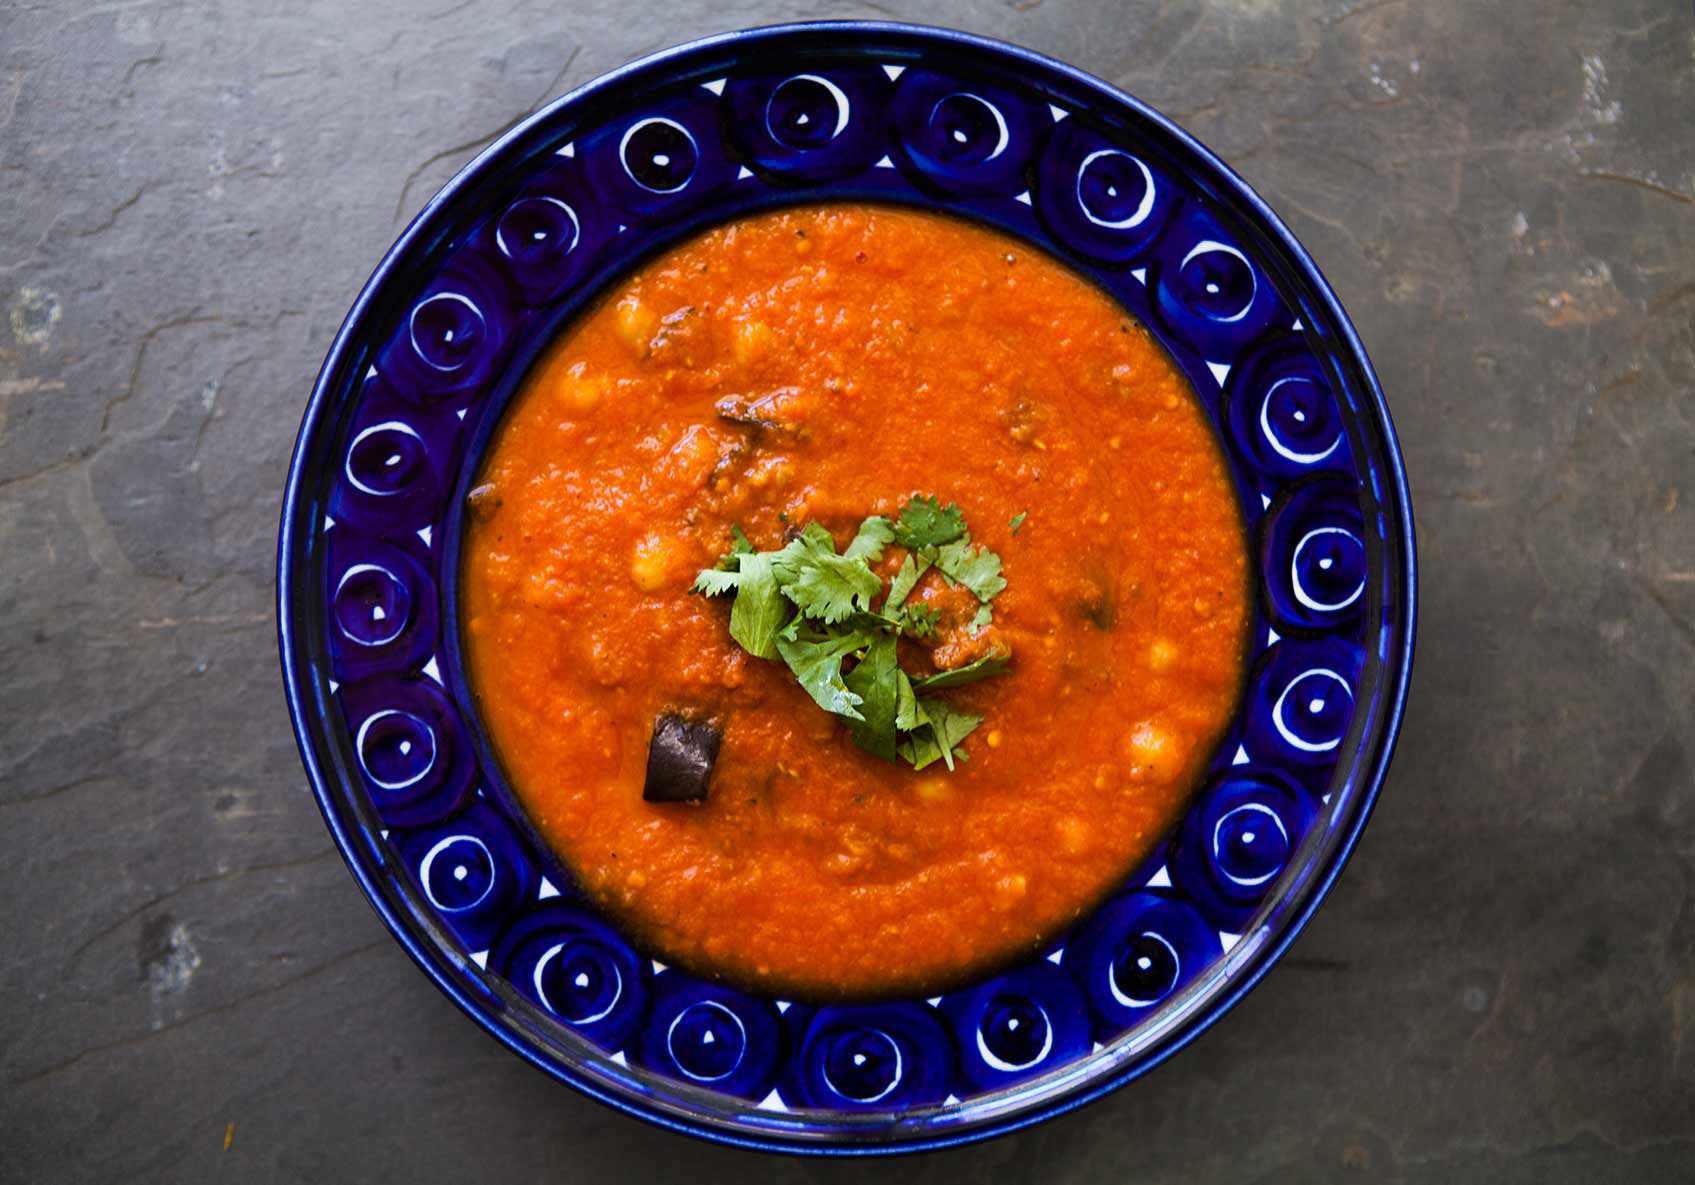 Roasted Eggplant Tomato Soup